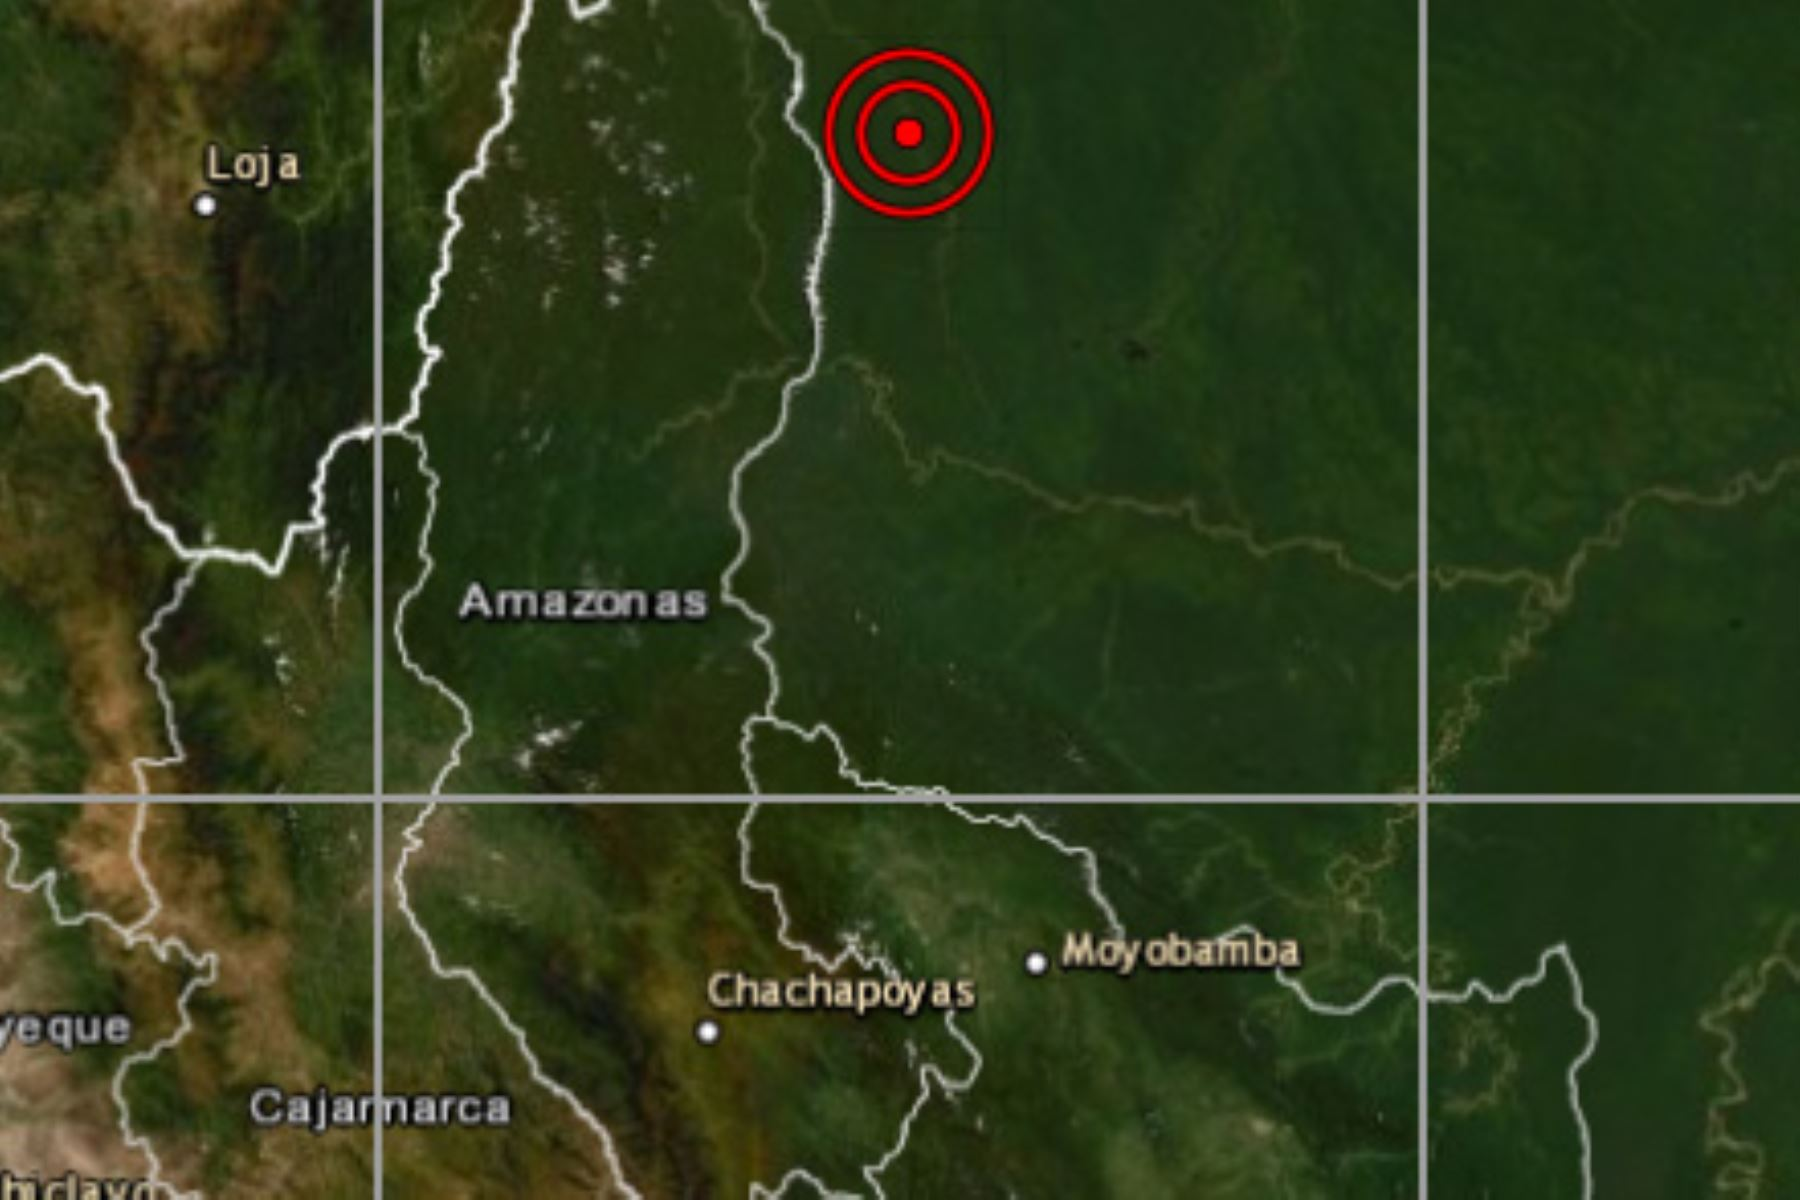 El IGP reportó un sismo de magnitud 4.8 en Santa Maria de Nieva, capital de la provincia amazonense de Condorcanqui.